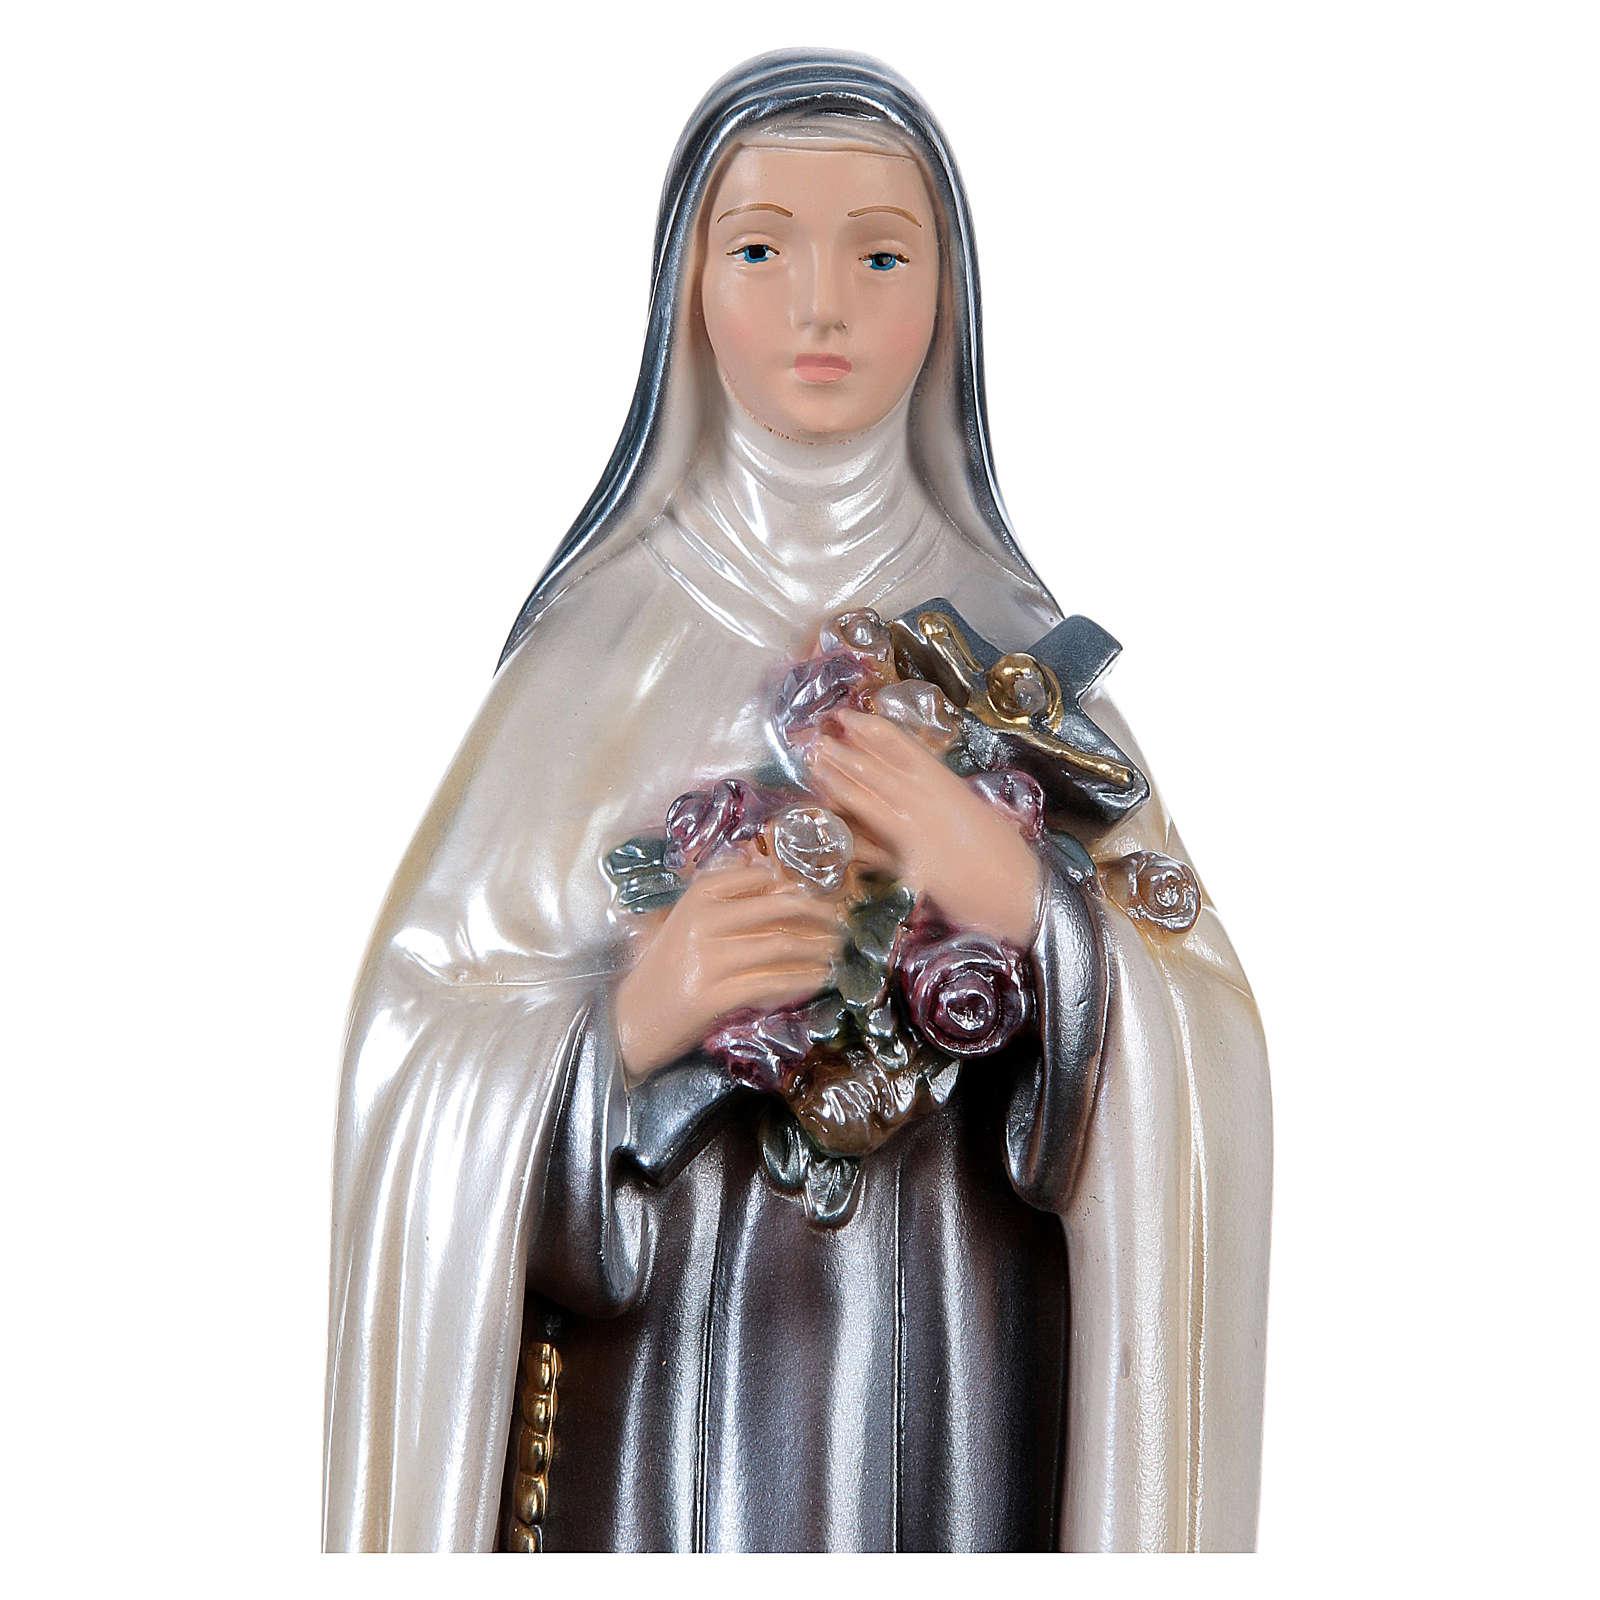 St Teresa 30 cm in mother-of-pearl plaster 4